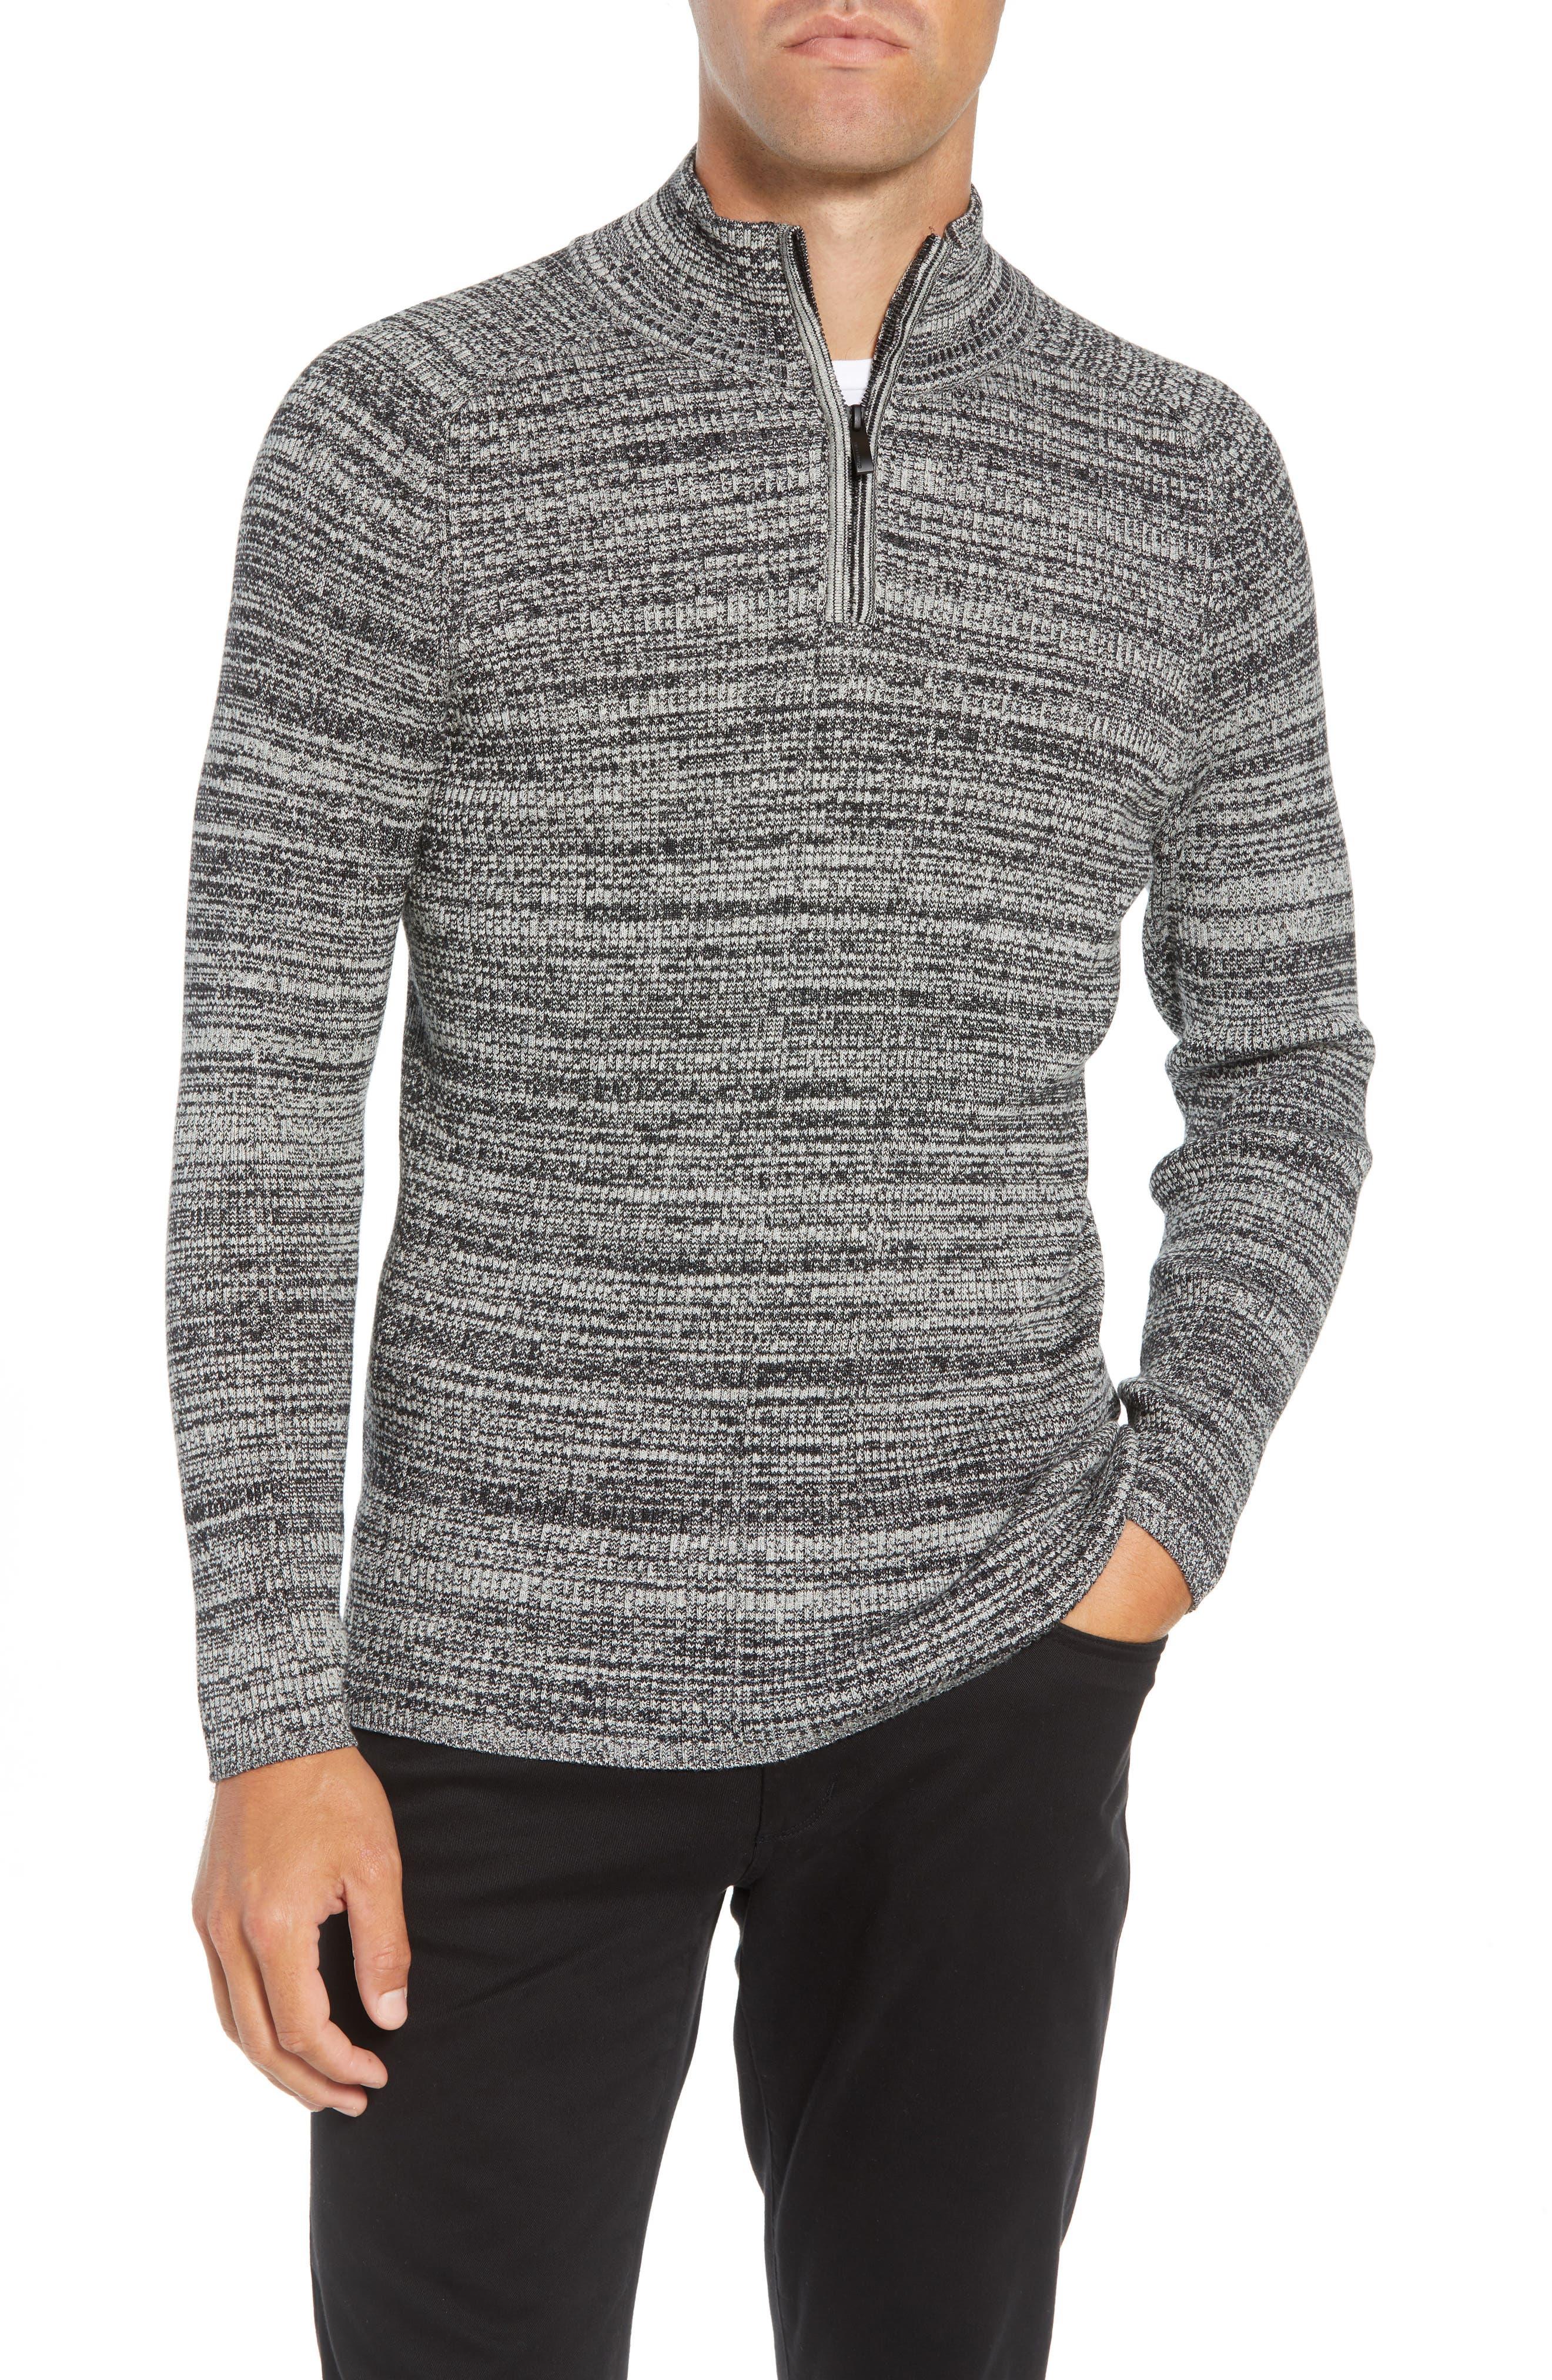 Vince Caumto Quarter Zip Mock Neck Sweater,                             Main thumbnail 1, color,                             GREY